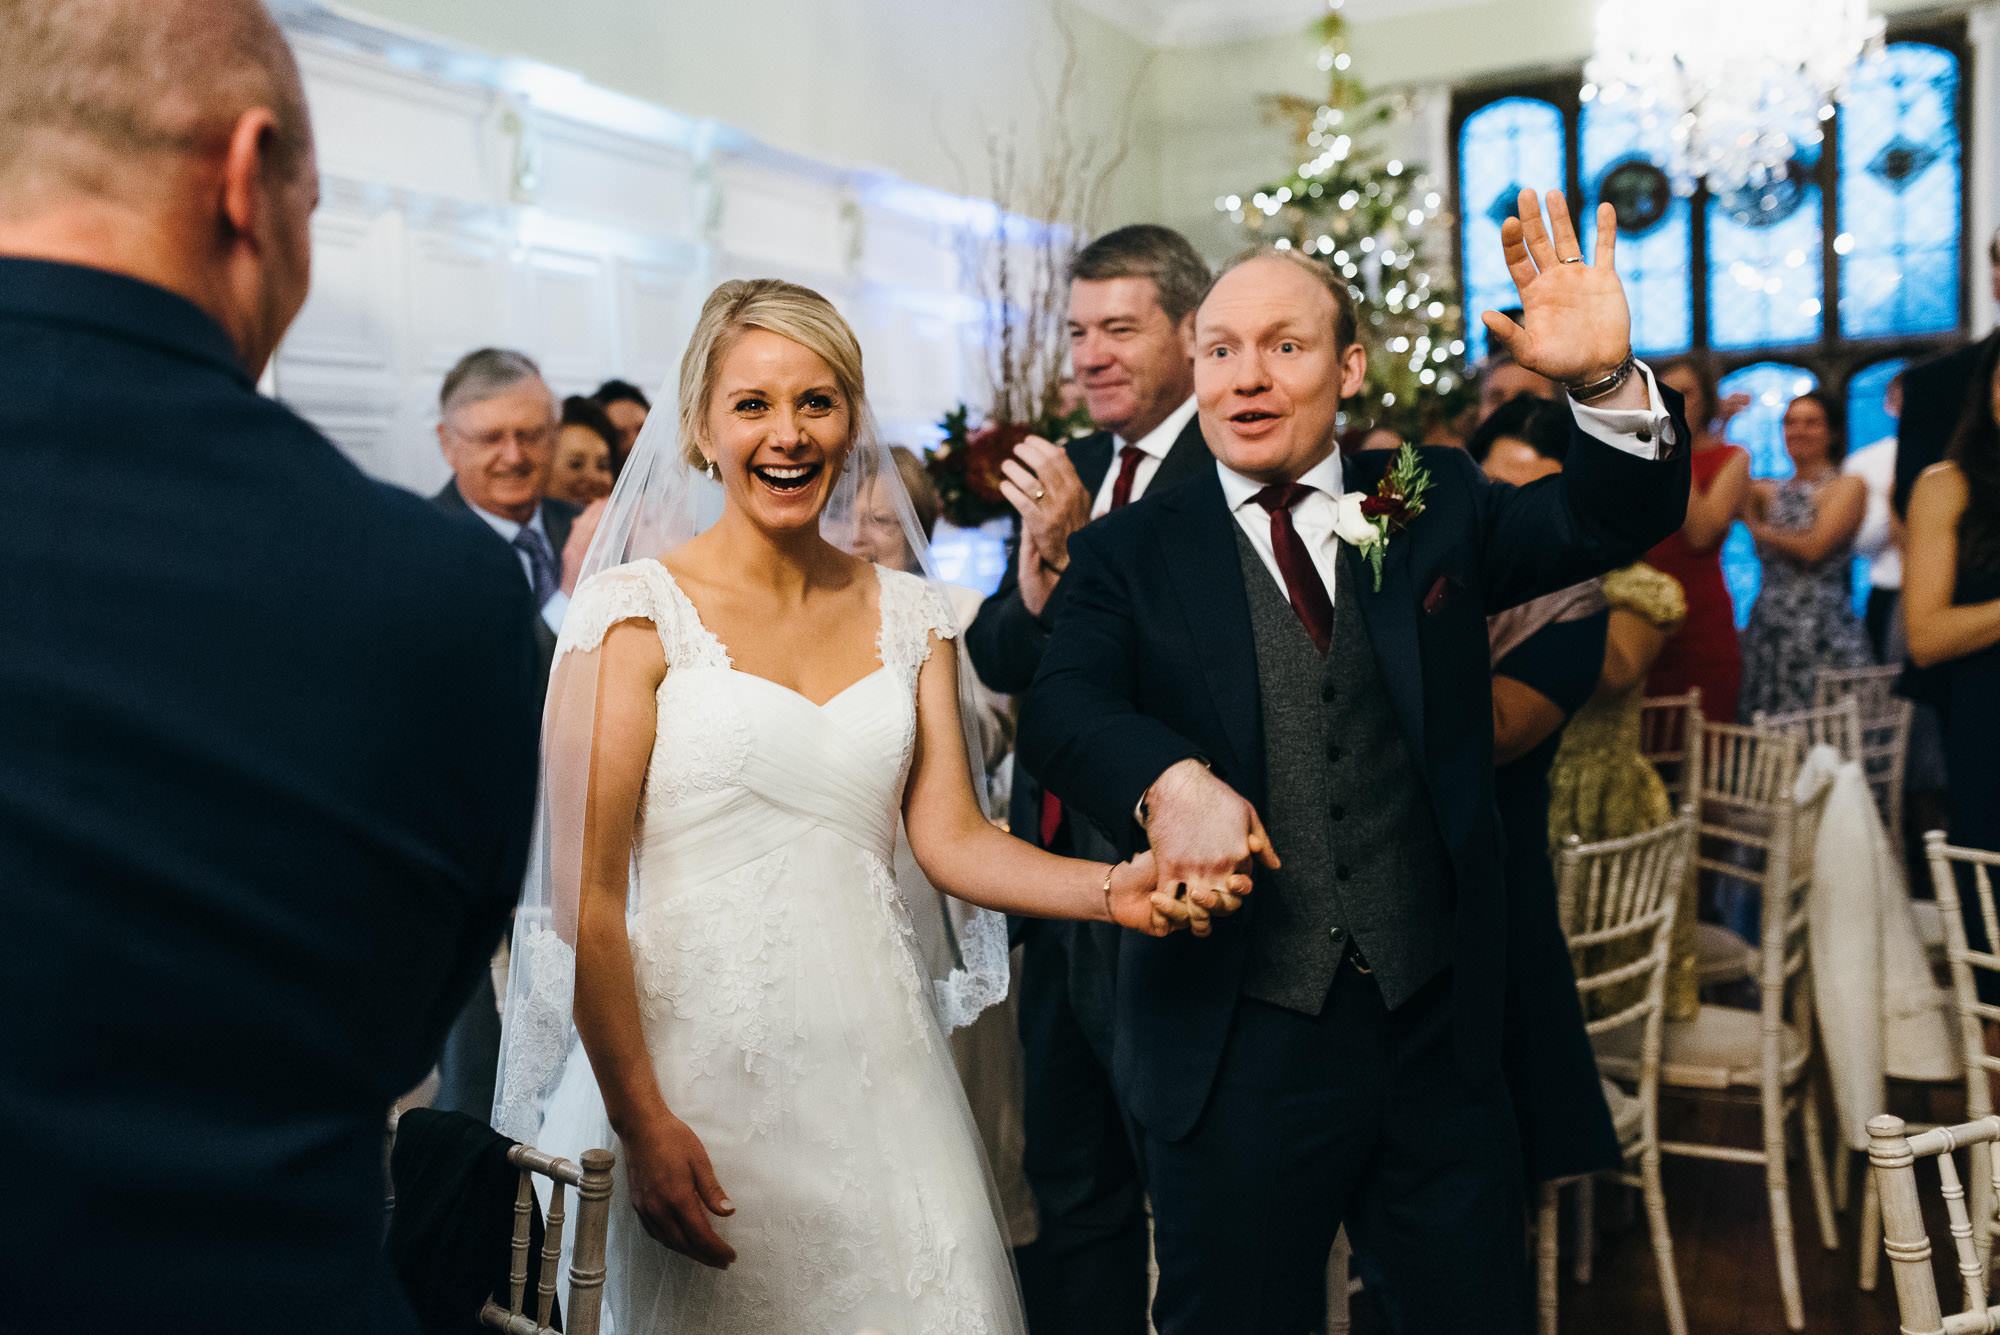 Hengrave hall weddings